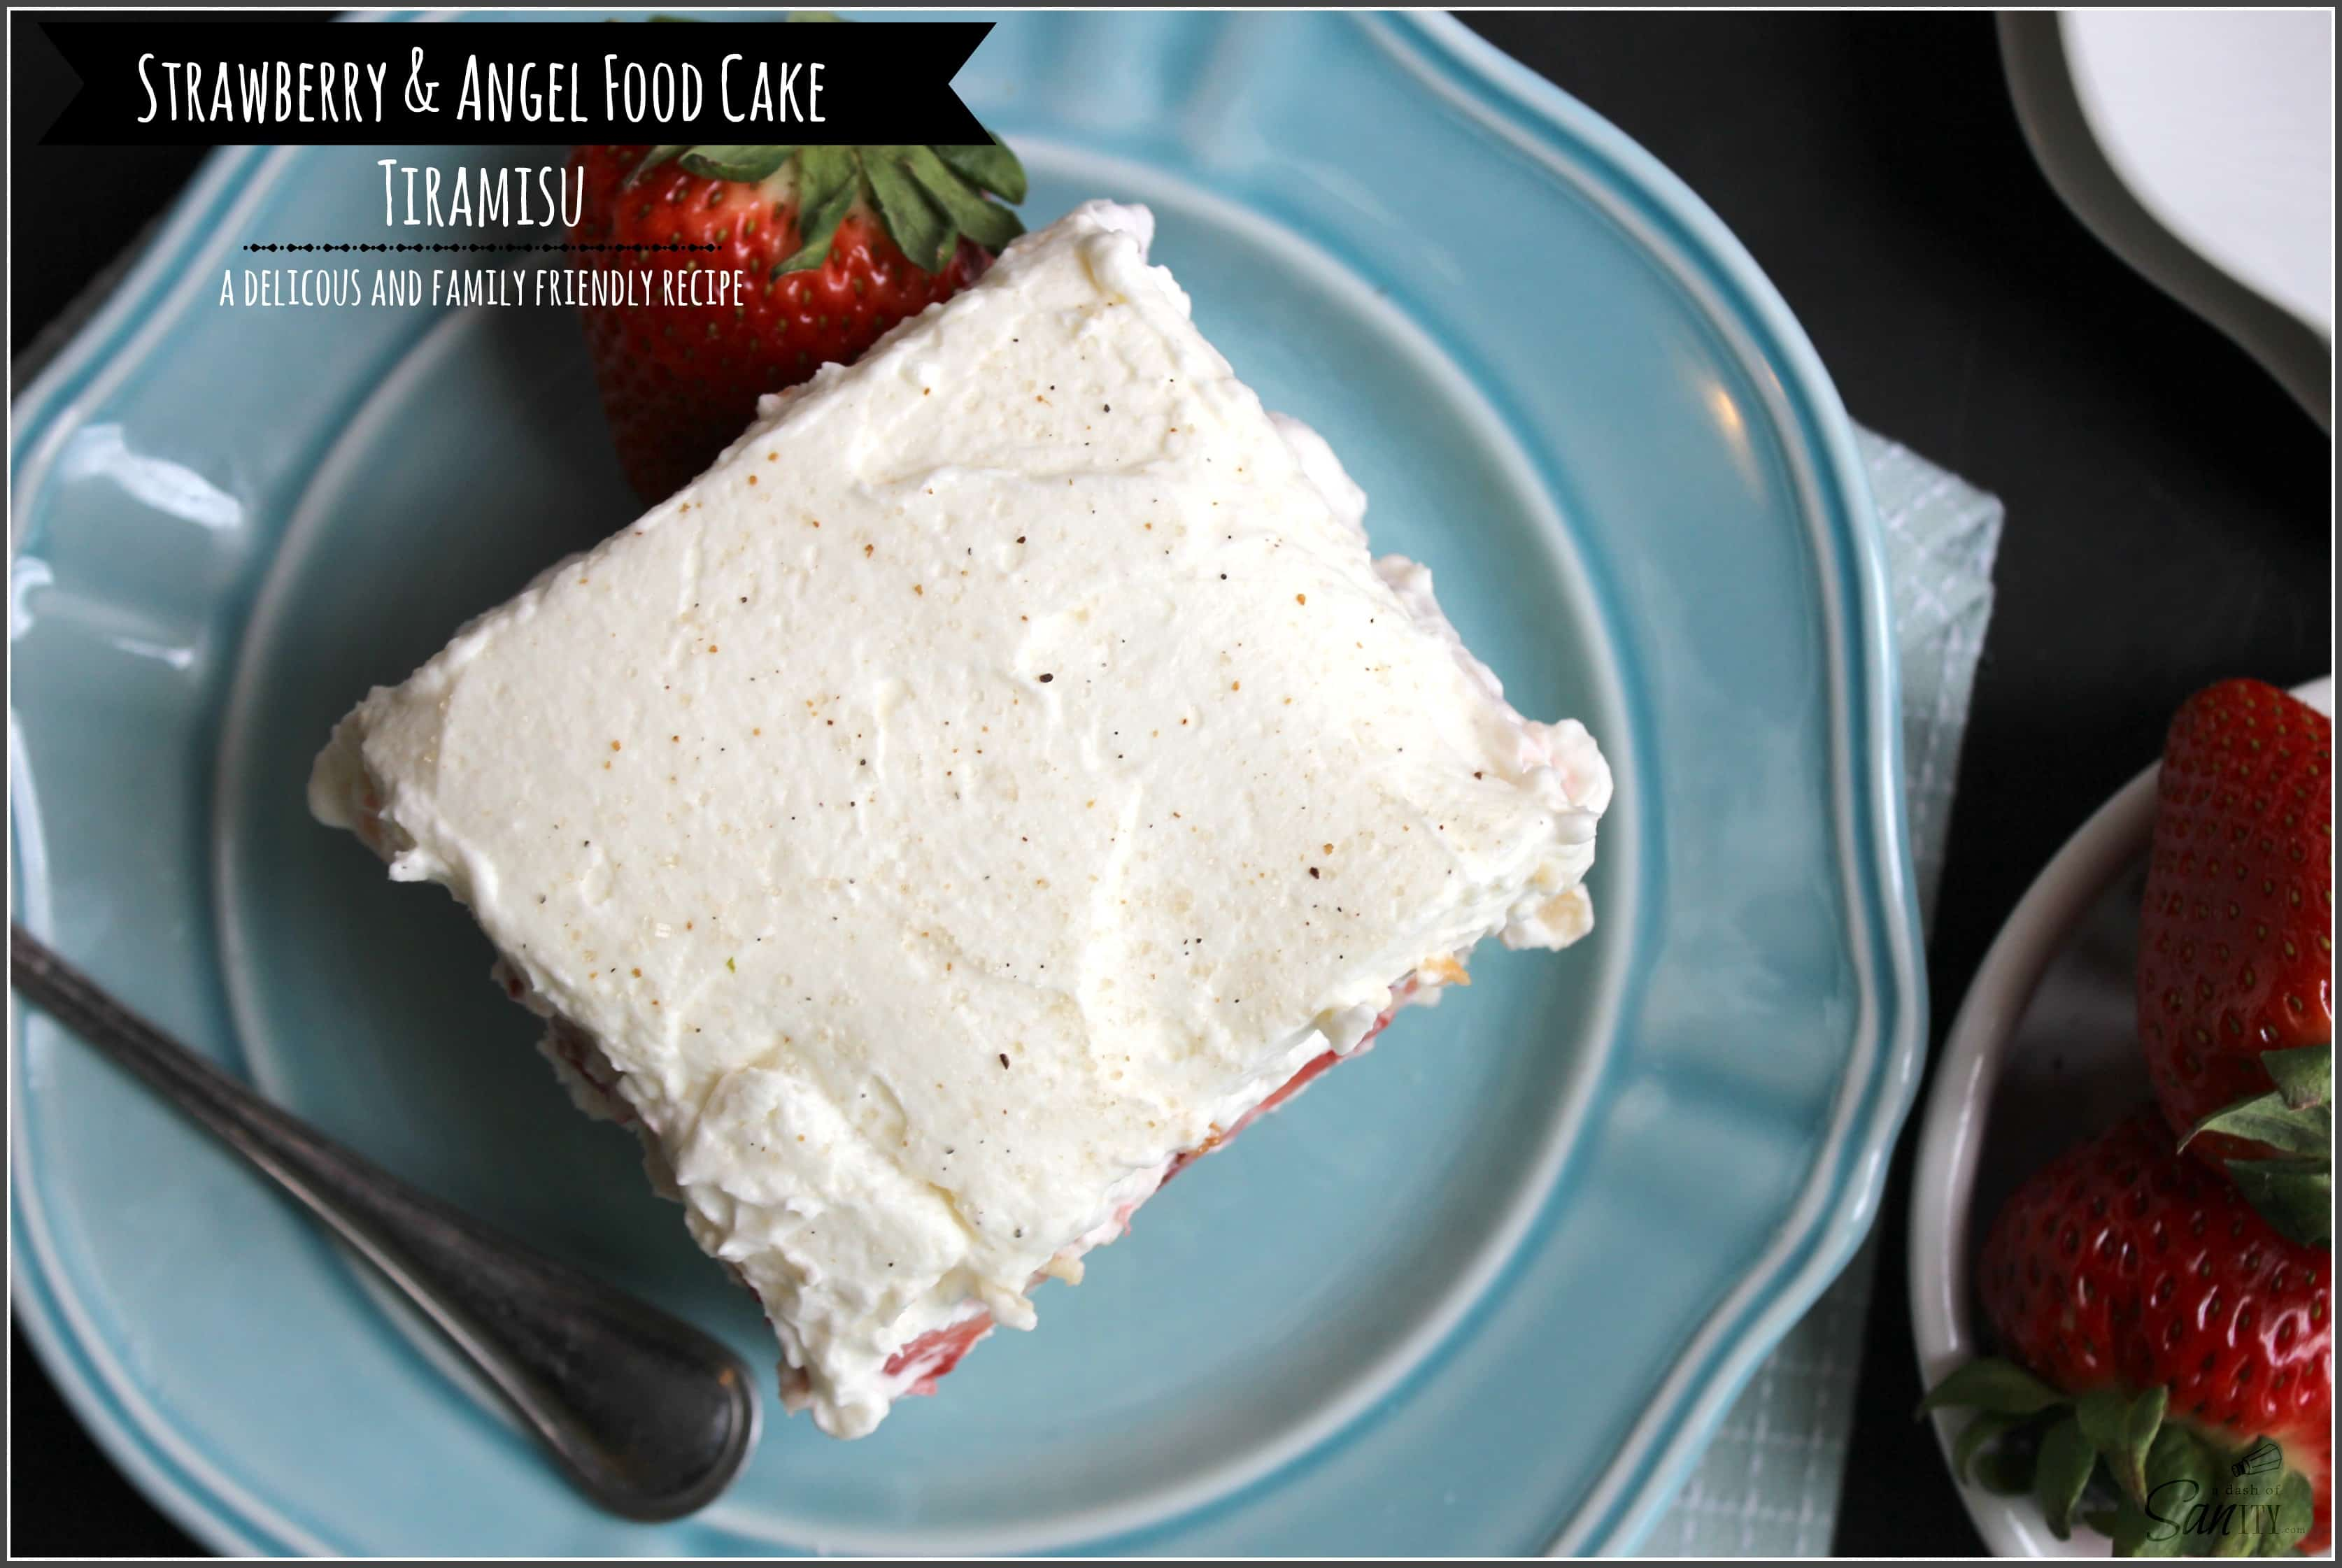 Strawberry & Angel Food Cake Tiramisu – a delicious & family friendly recipe